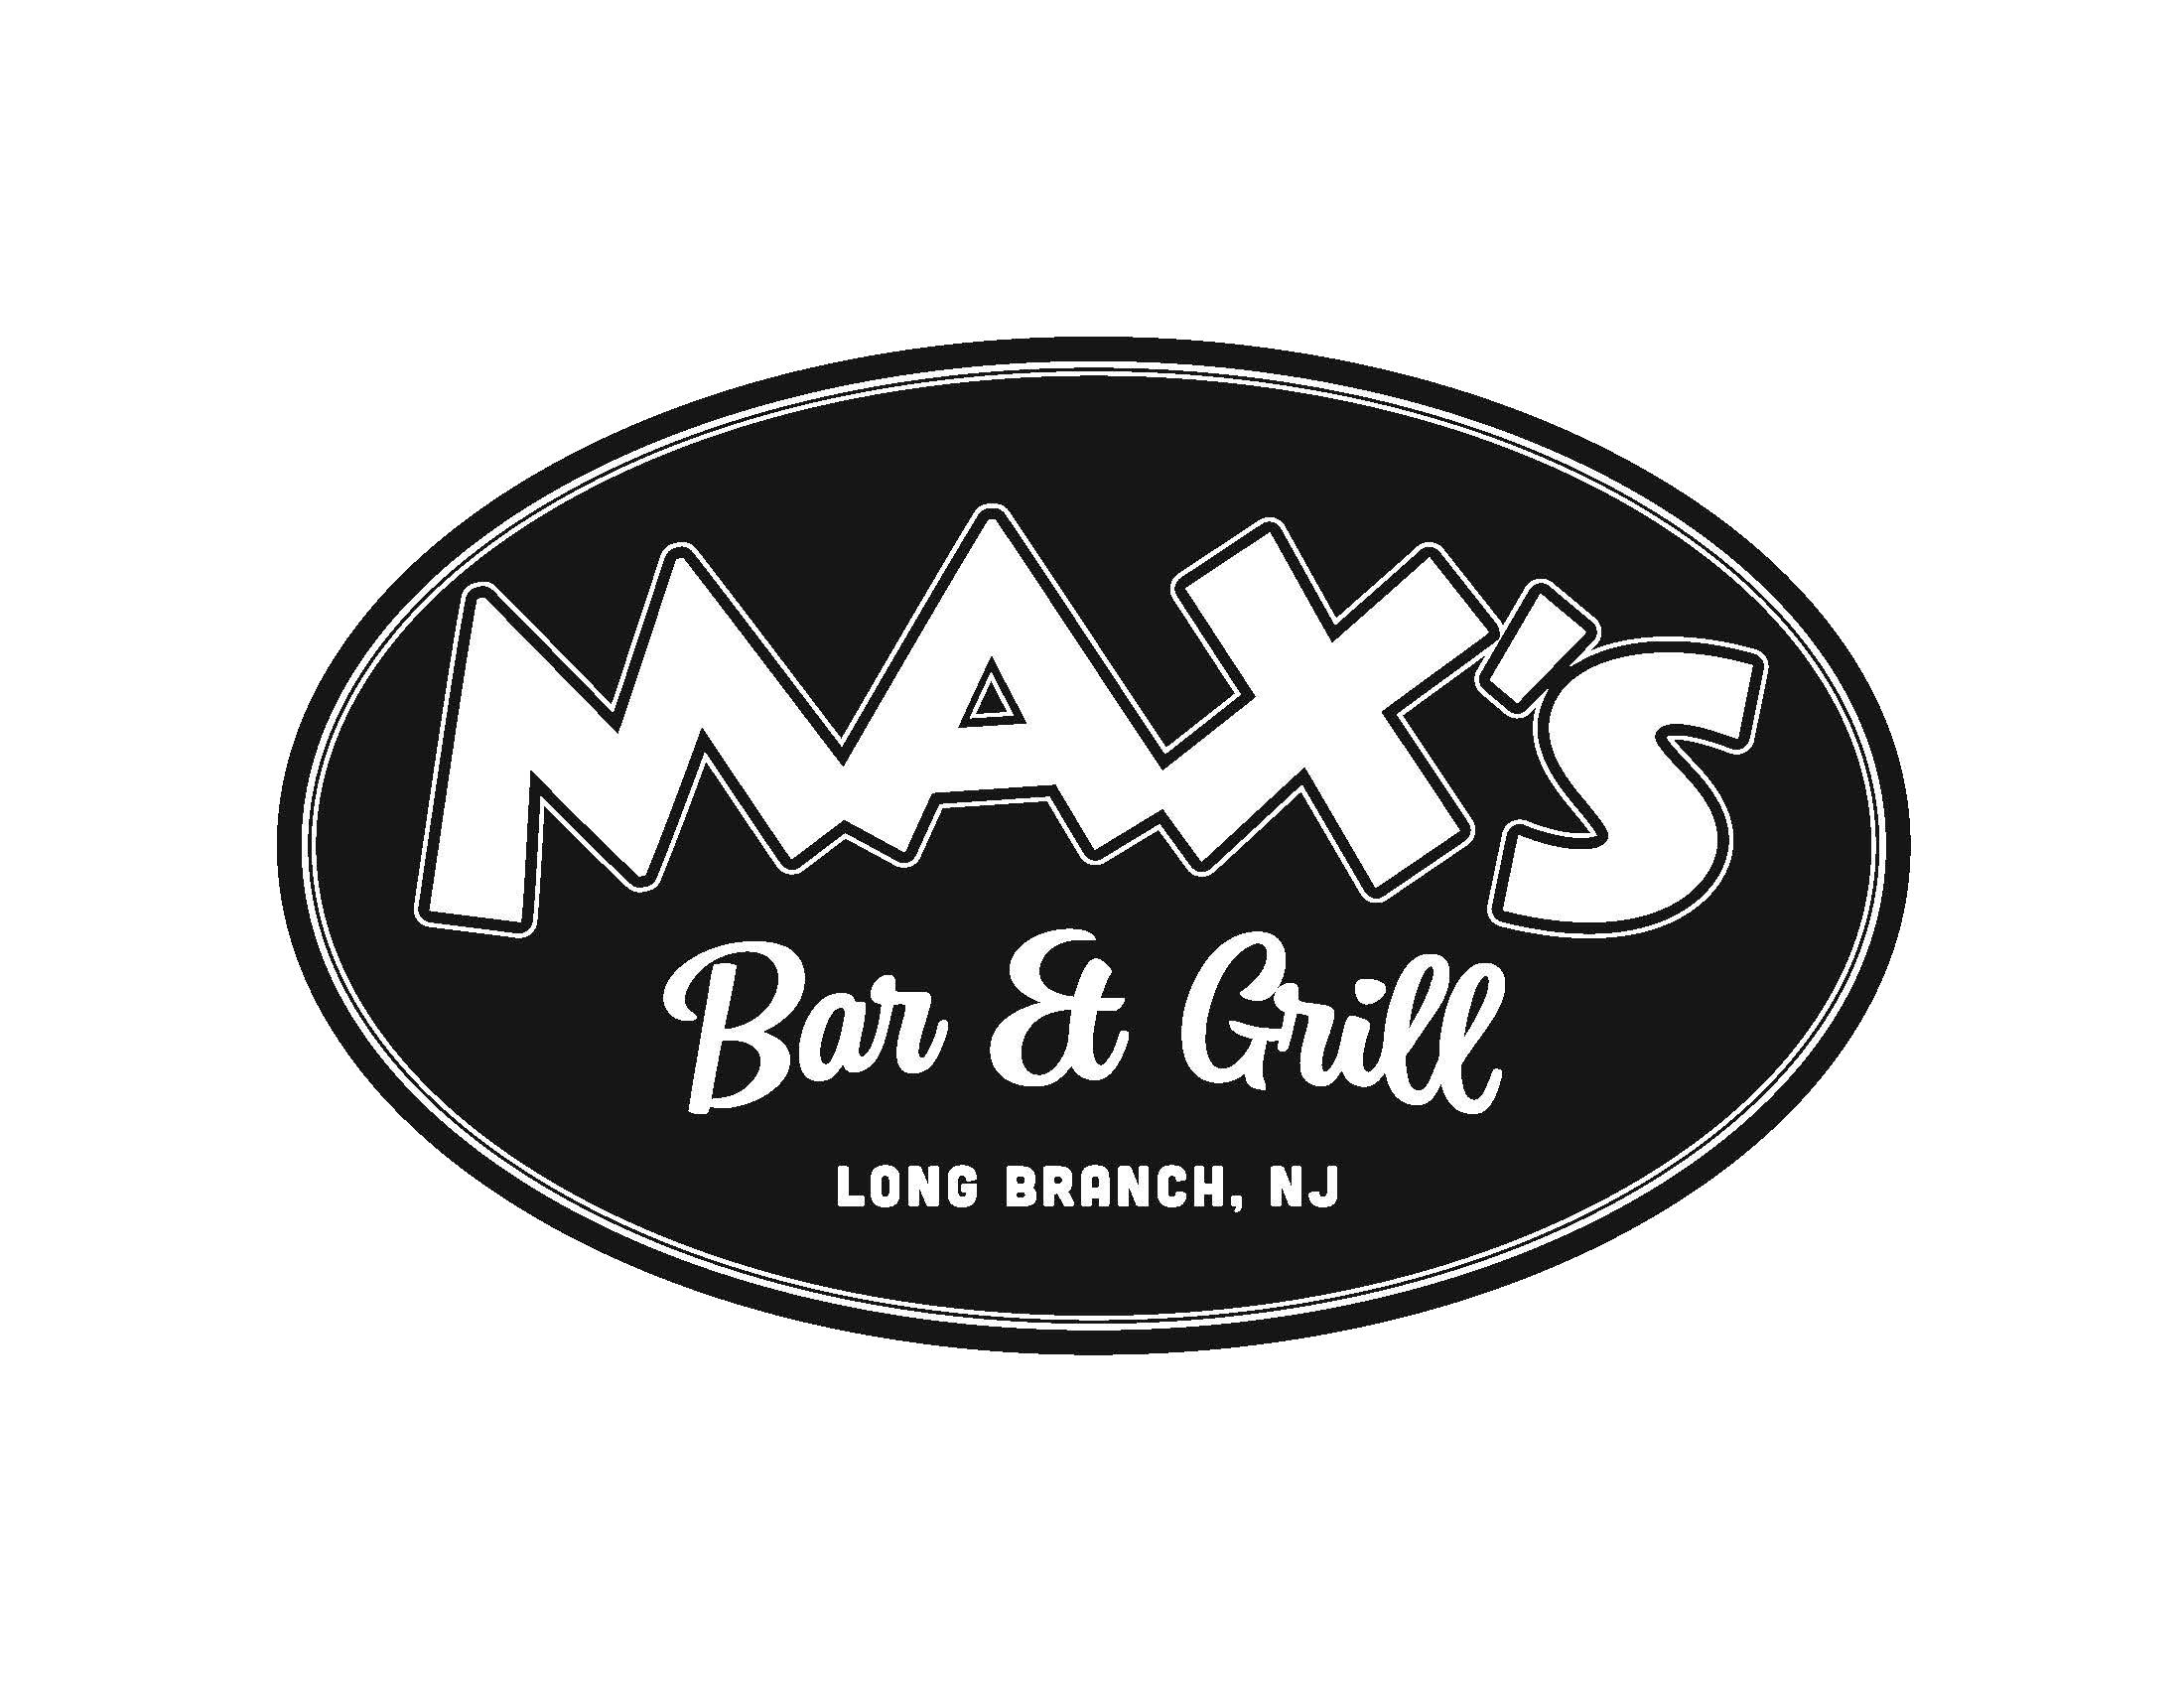 Maxs bar and grill logo